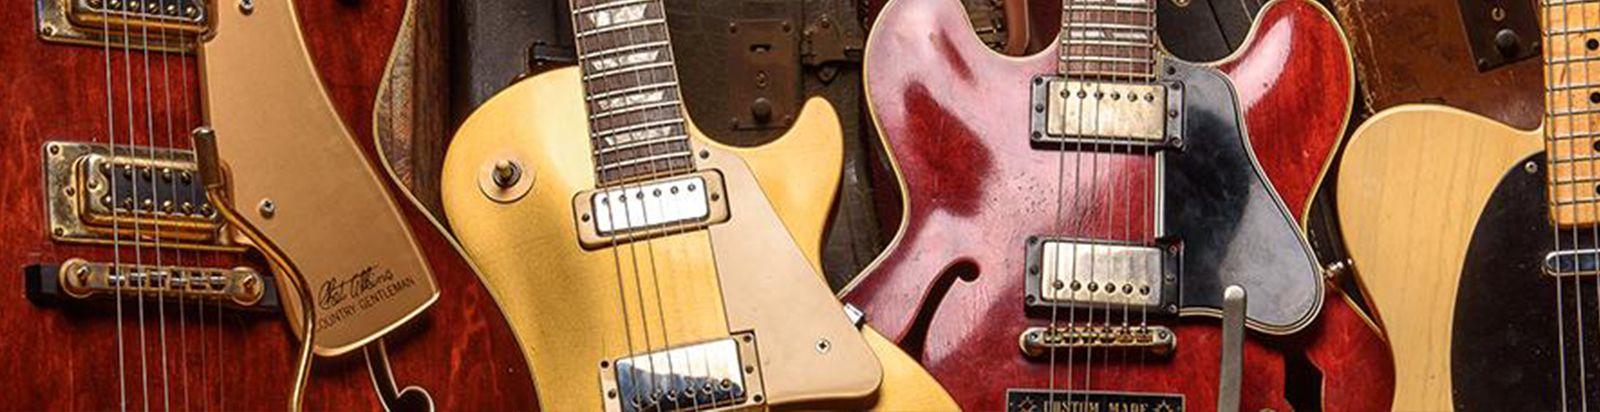 Vintage Guitars at Chicago Music Exchange